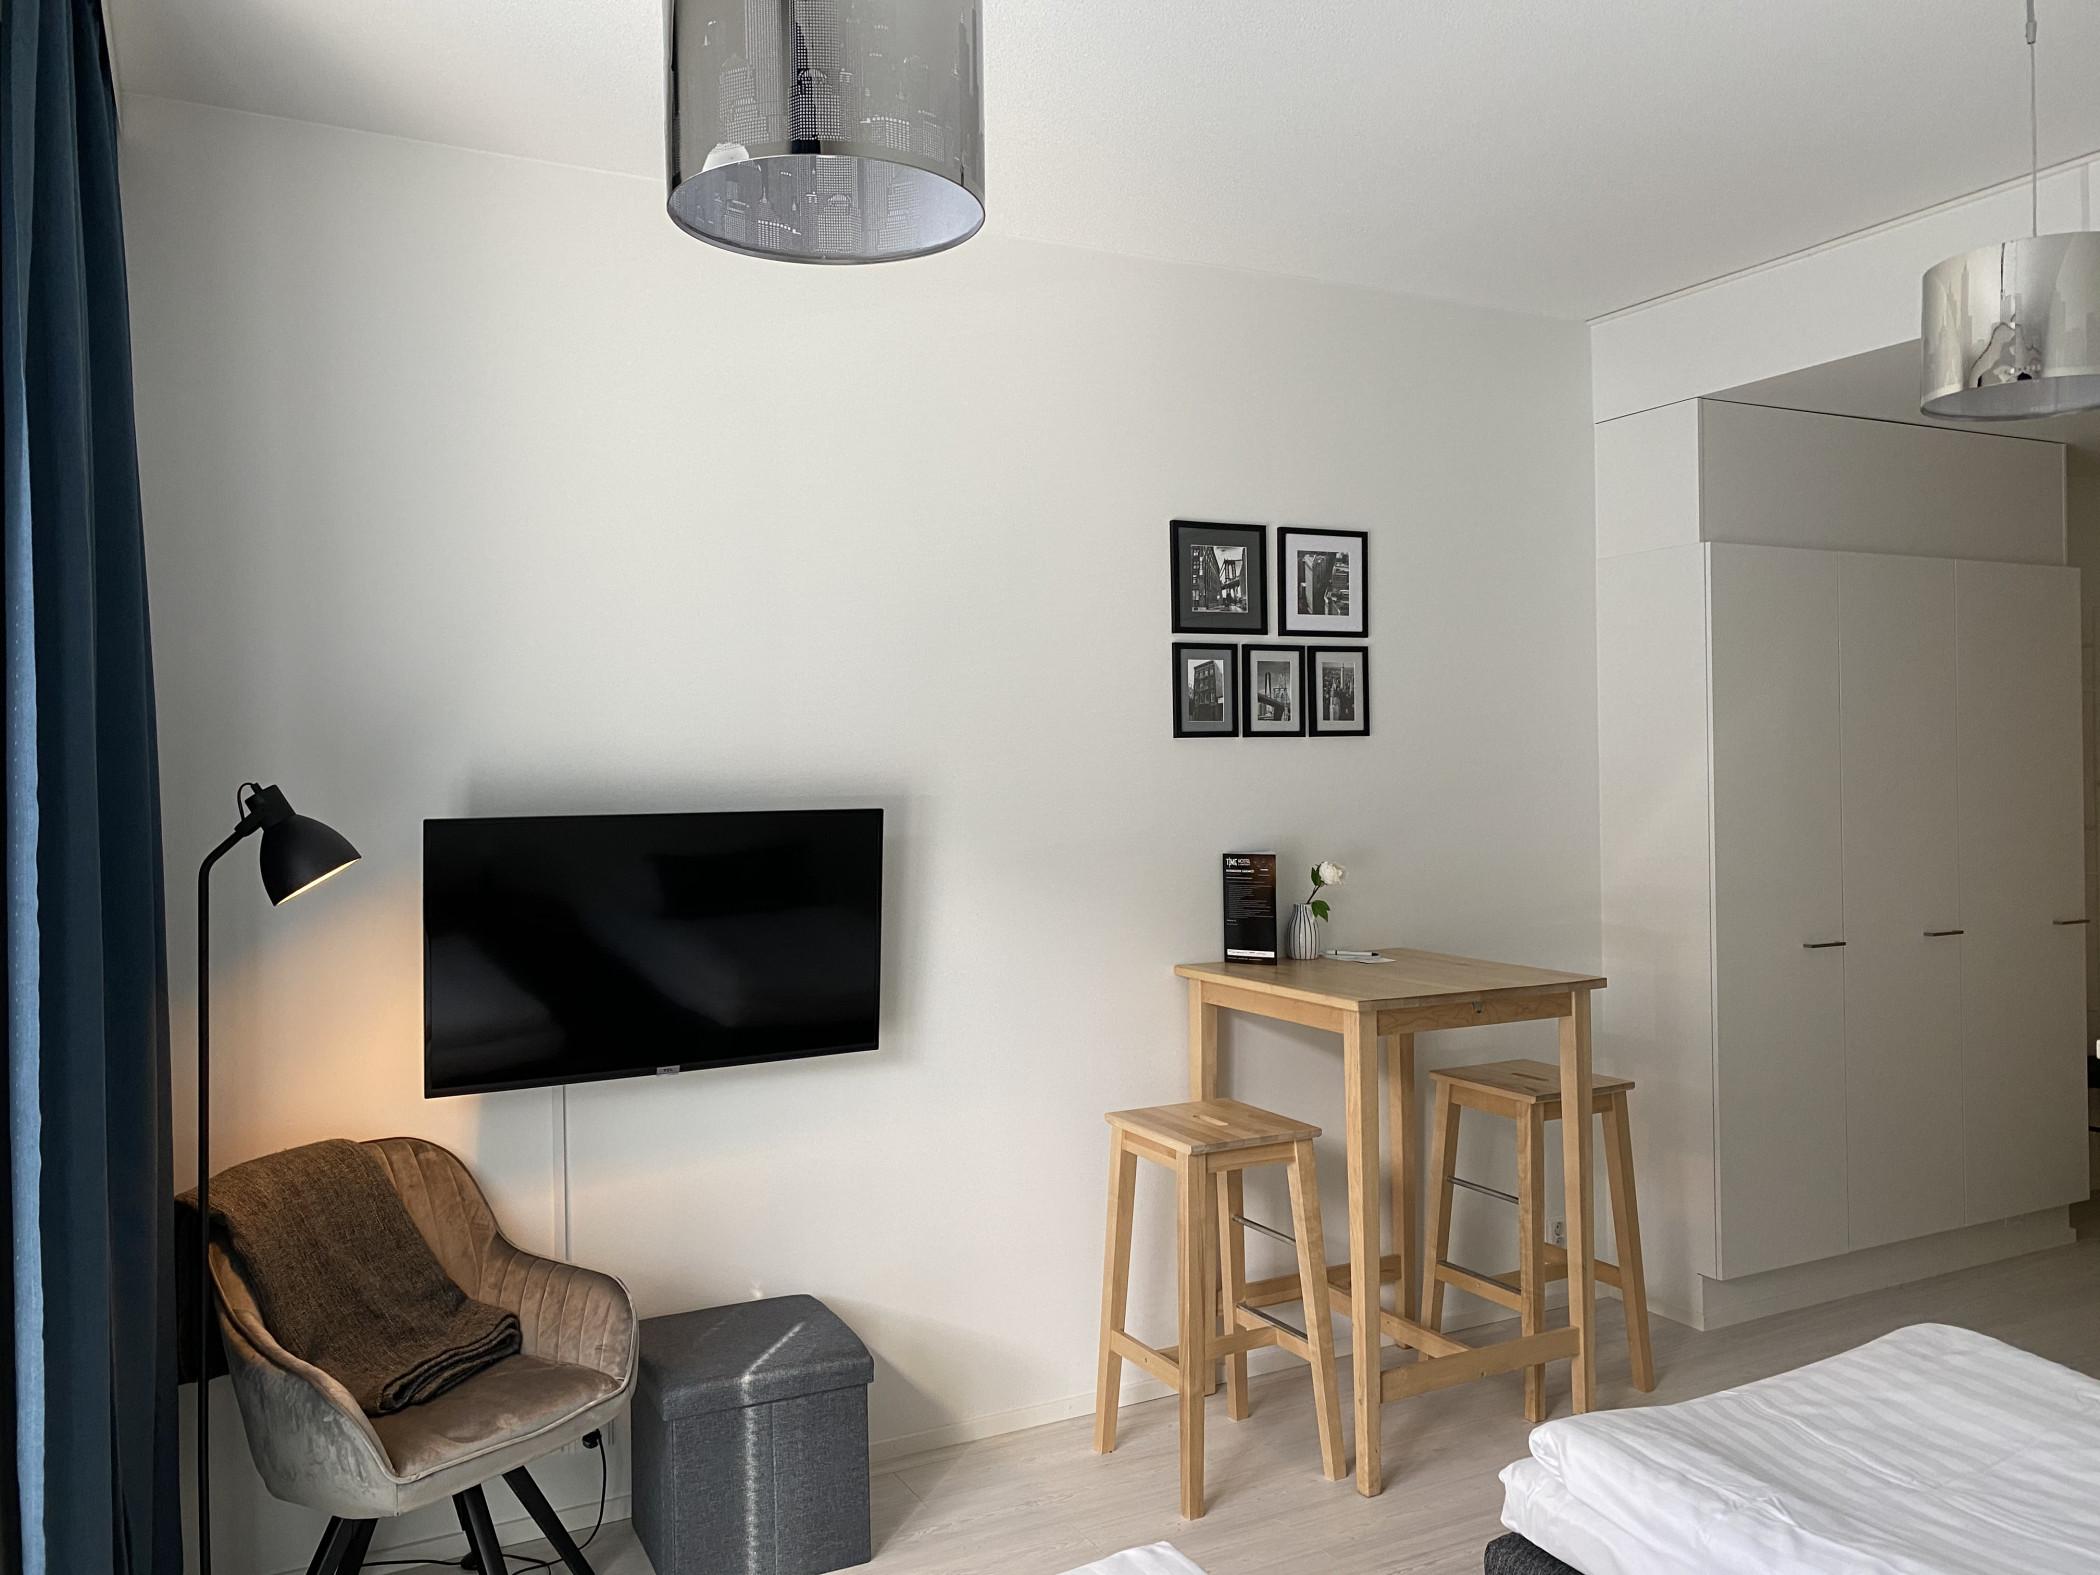 Time Apartments Ylistönmäentie 33 A 9